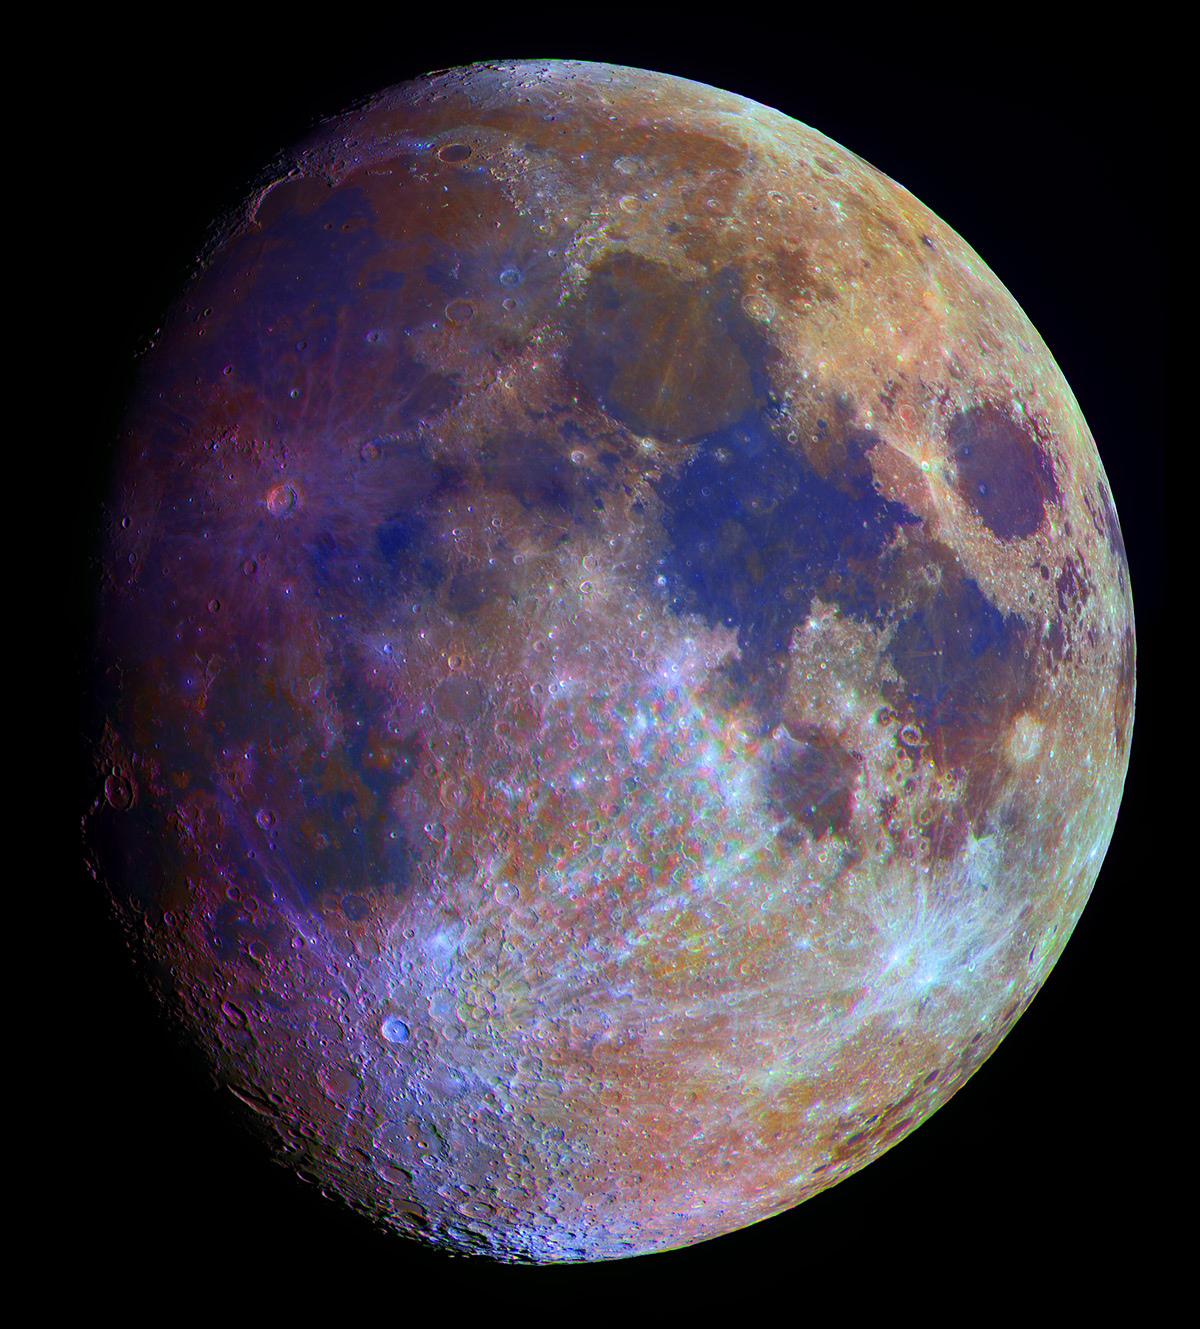 Mooncolor_060110_25.jpg